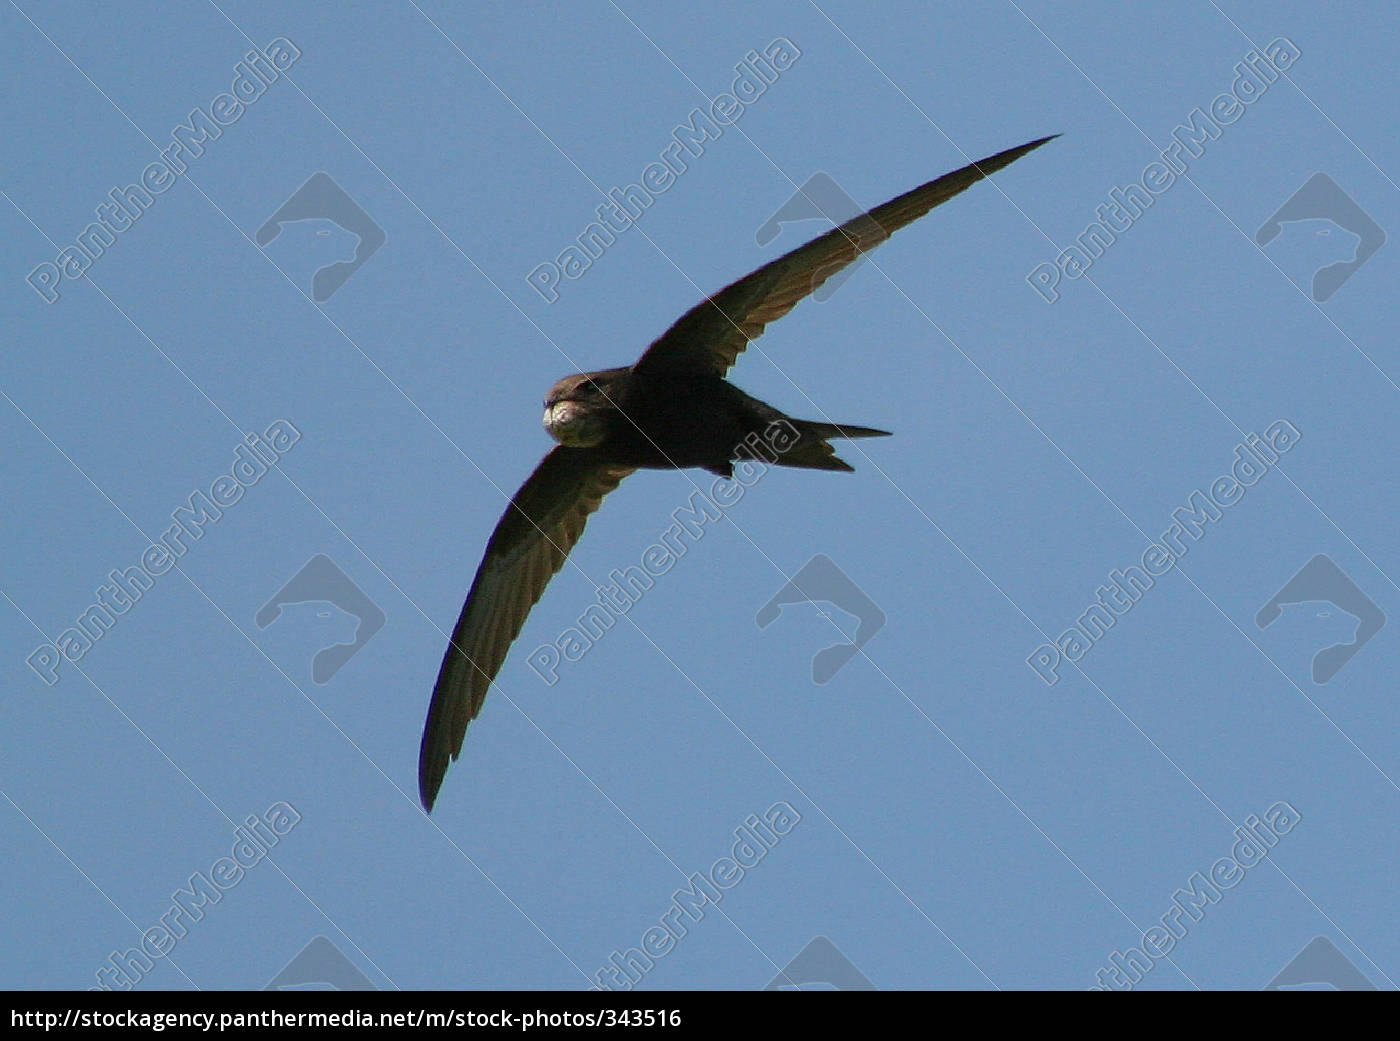 swift-wildlife - 343516